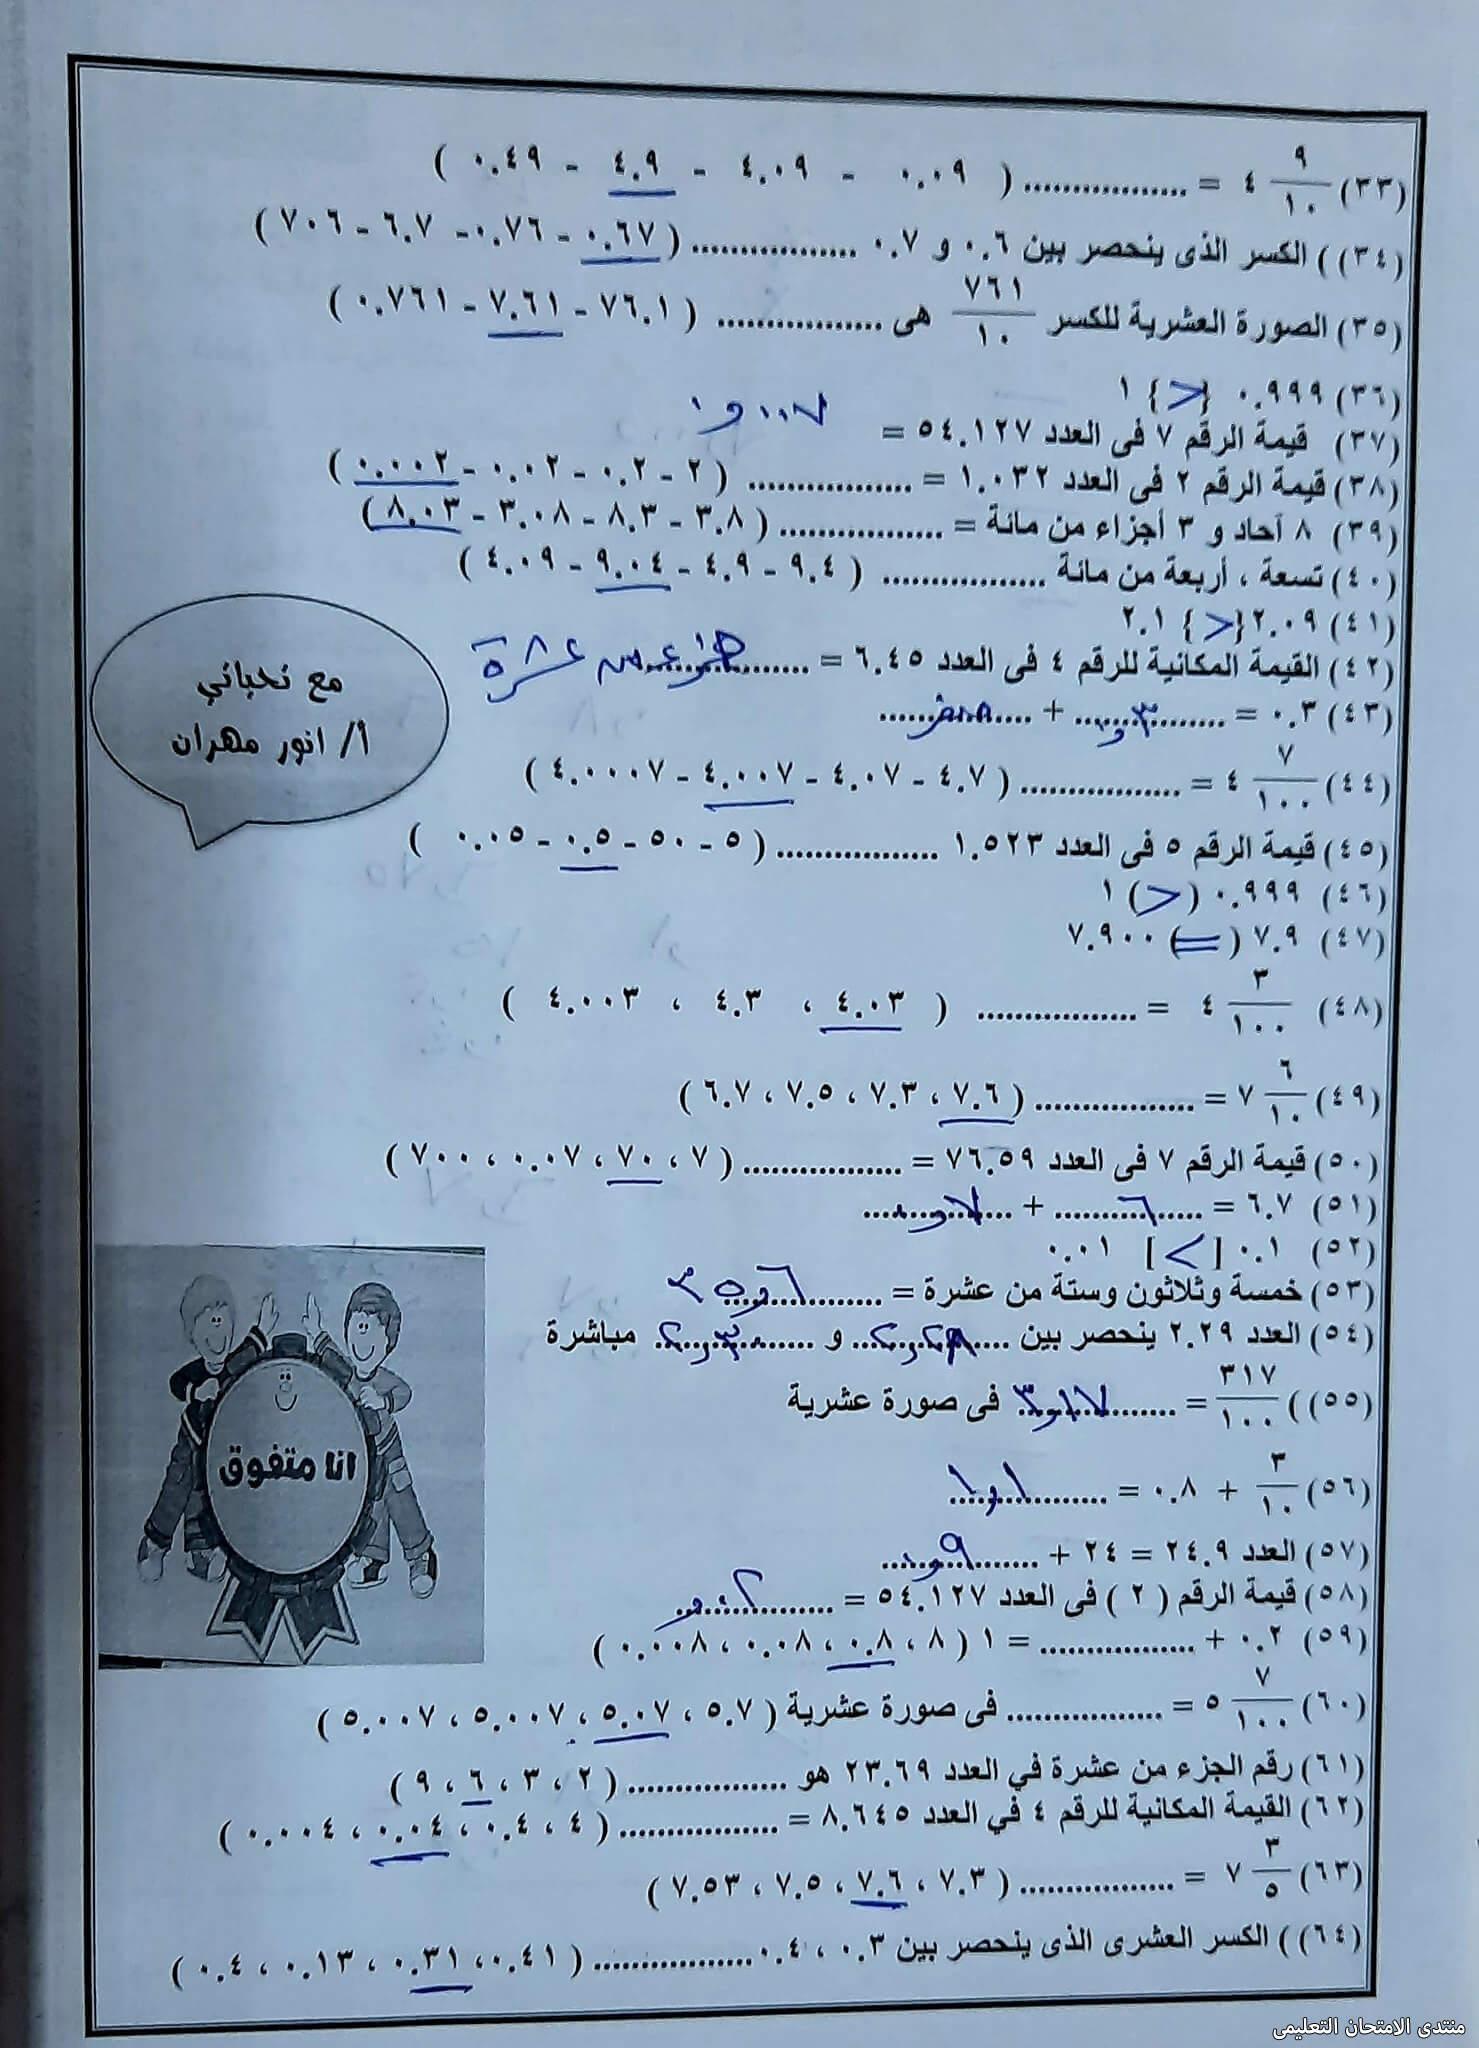 exam-eg.com_161642072168552.jpg